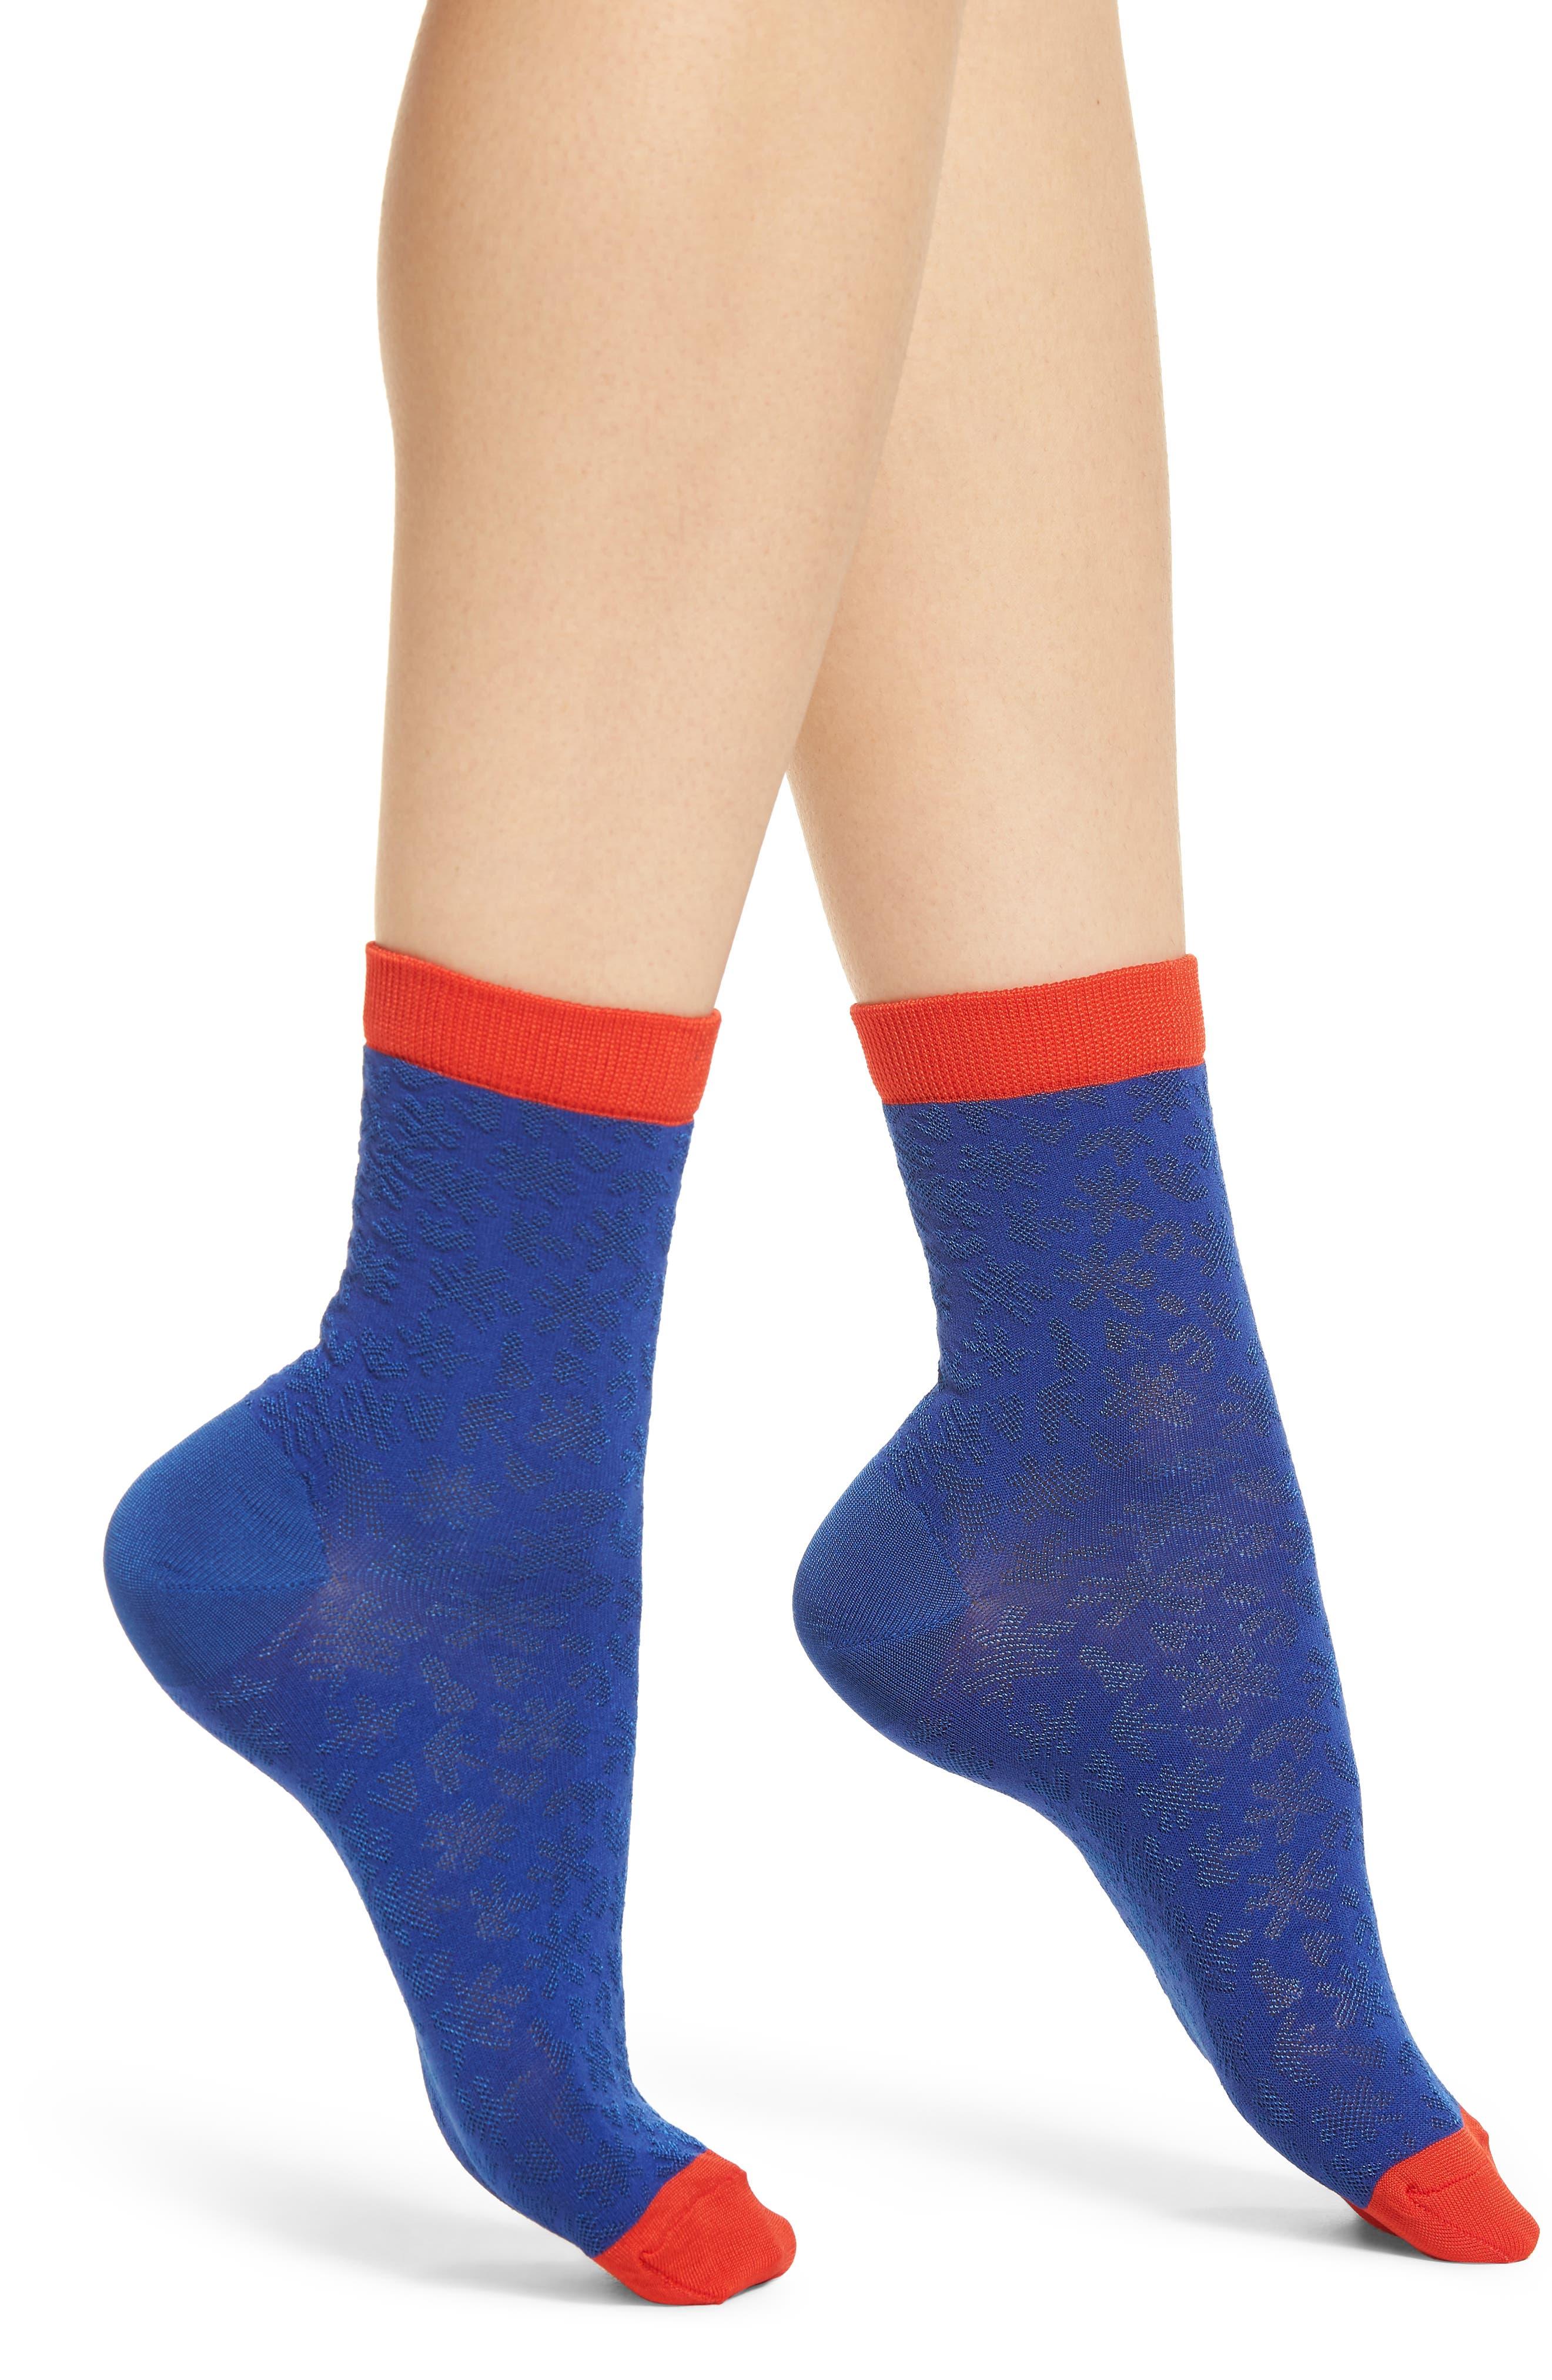 Alternate Image 1 Selected - Hysteria by Happy Socks Lotta Ankle Socks